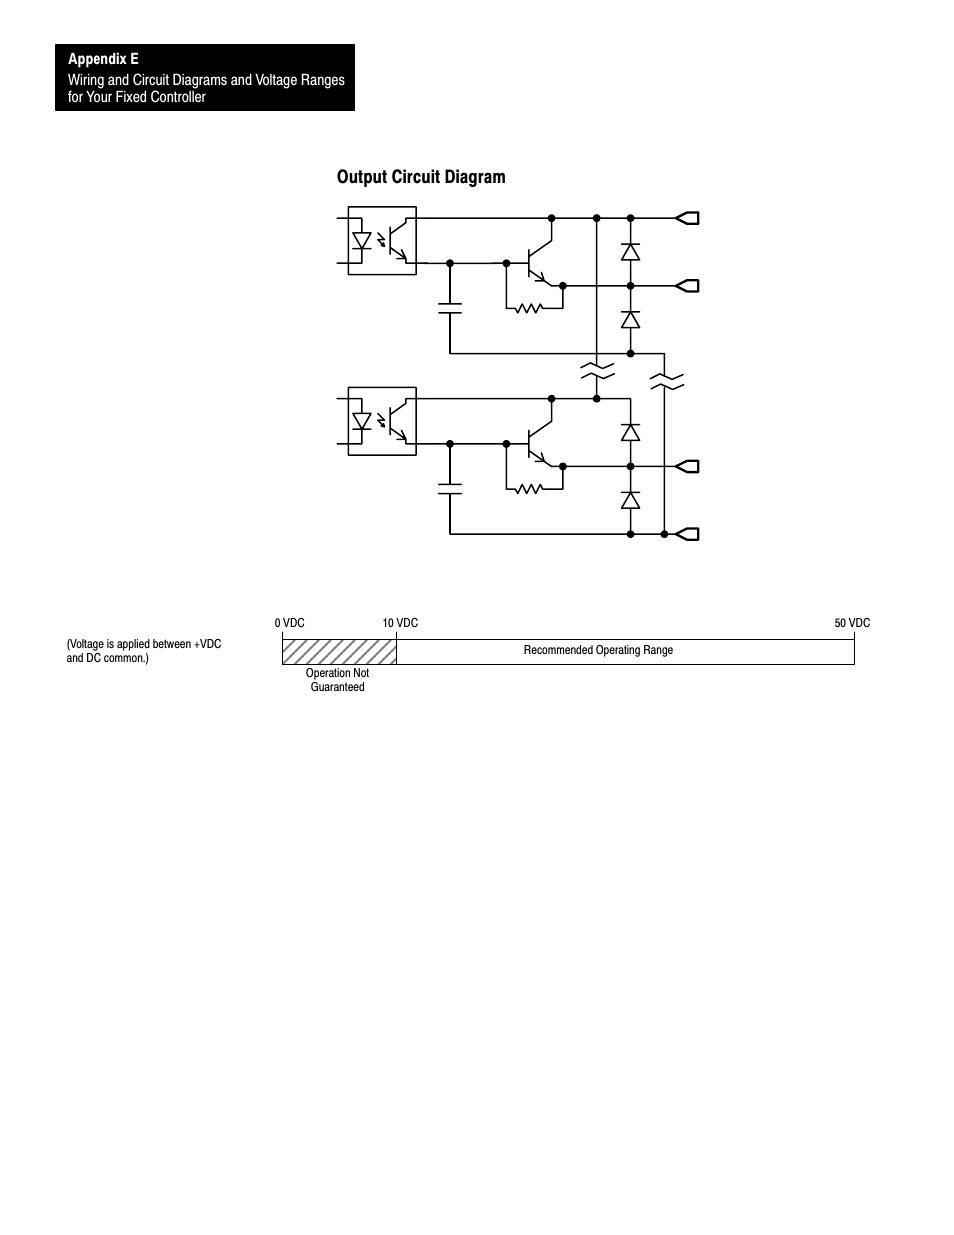 fixed circuit diagram output circuit diagram  e 22  operating voltage range rockwell  output circuit diagram  e 22  operating